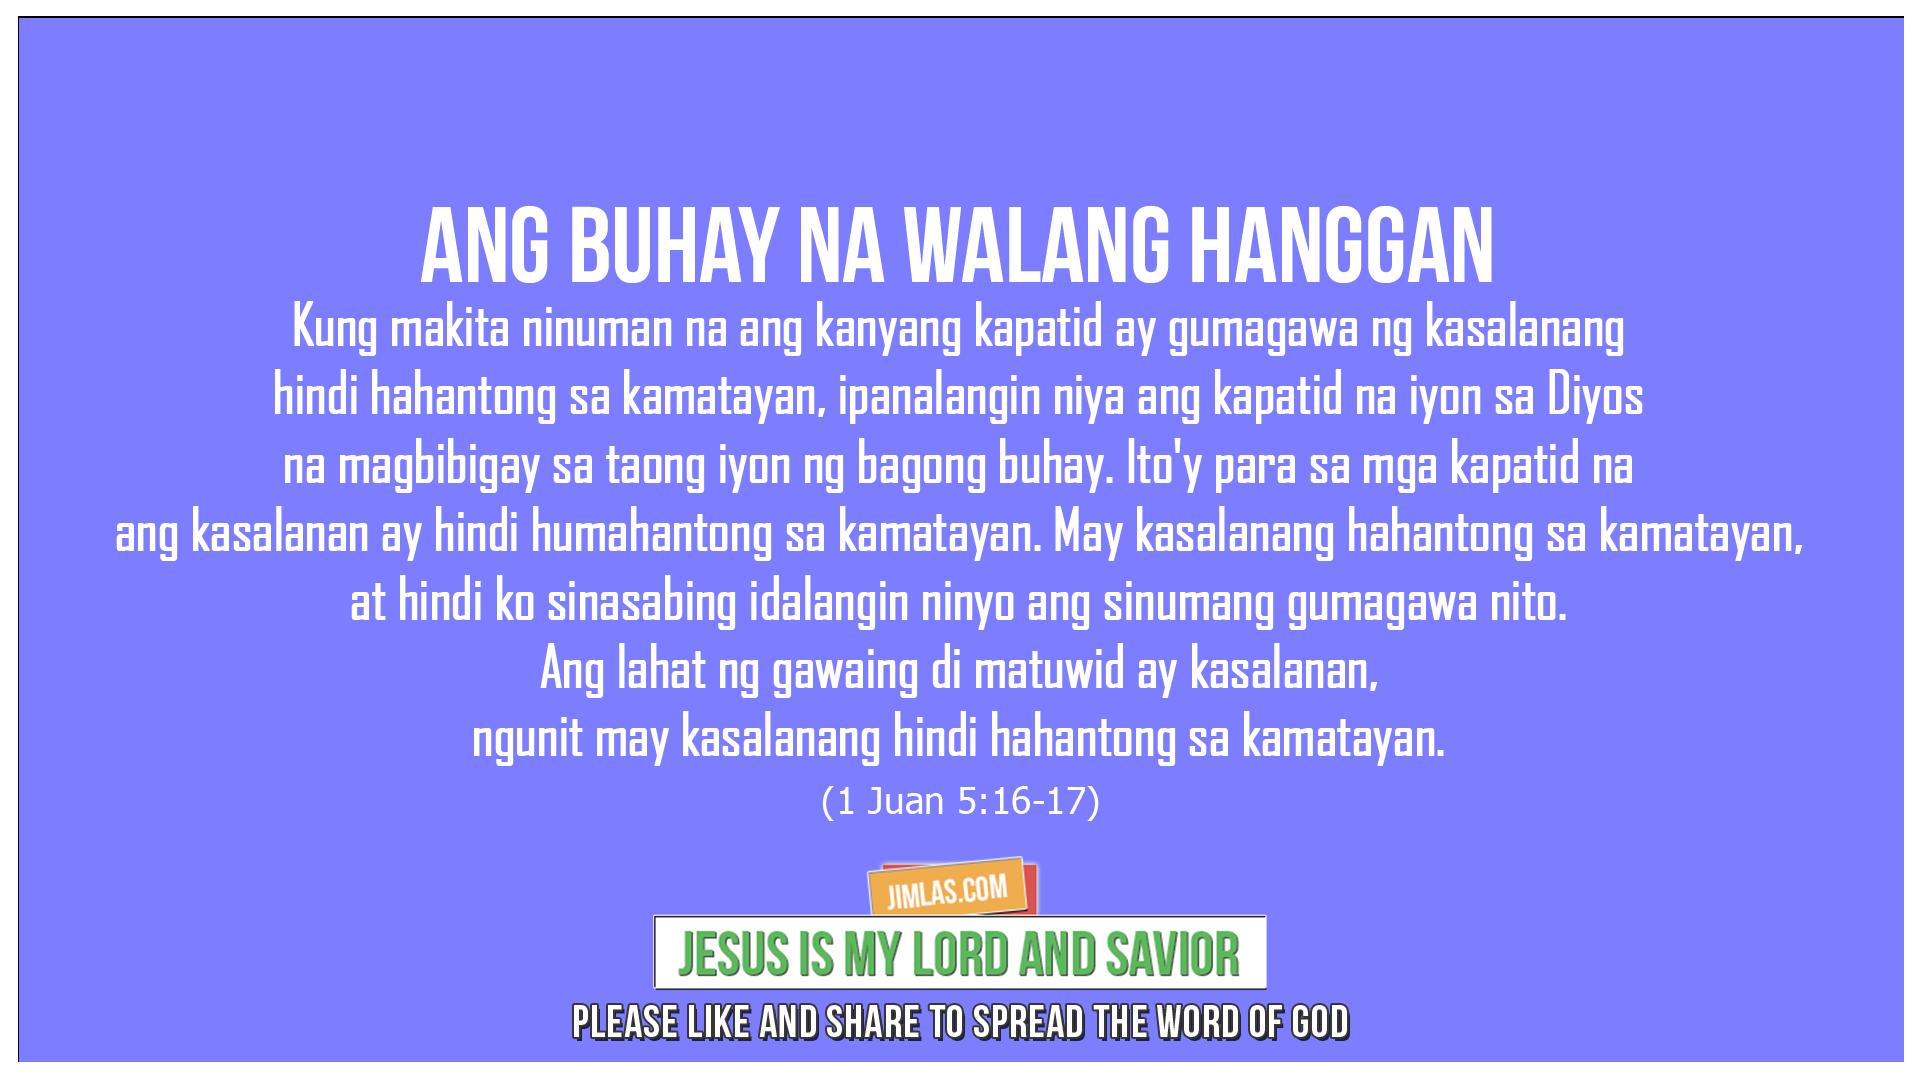 1 Juan 5:16-17, 1 Juan 5:16-17